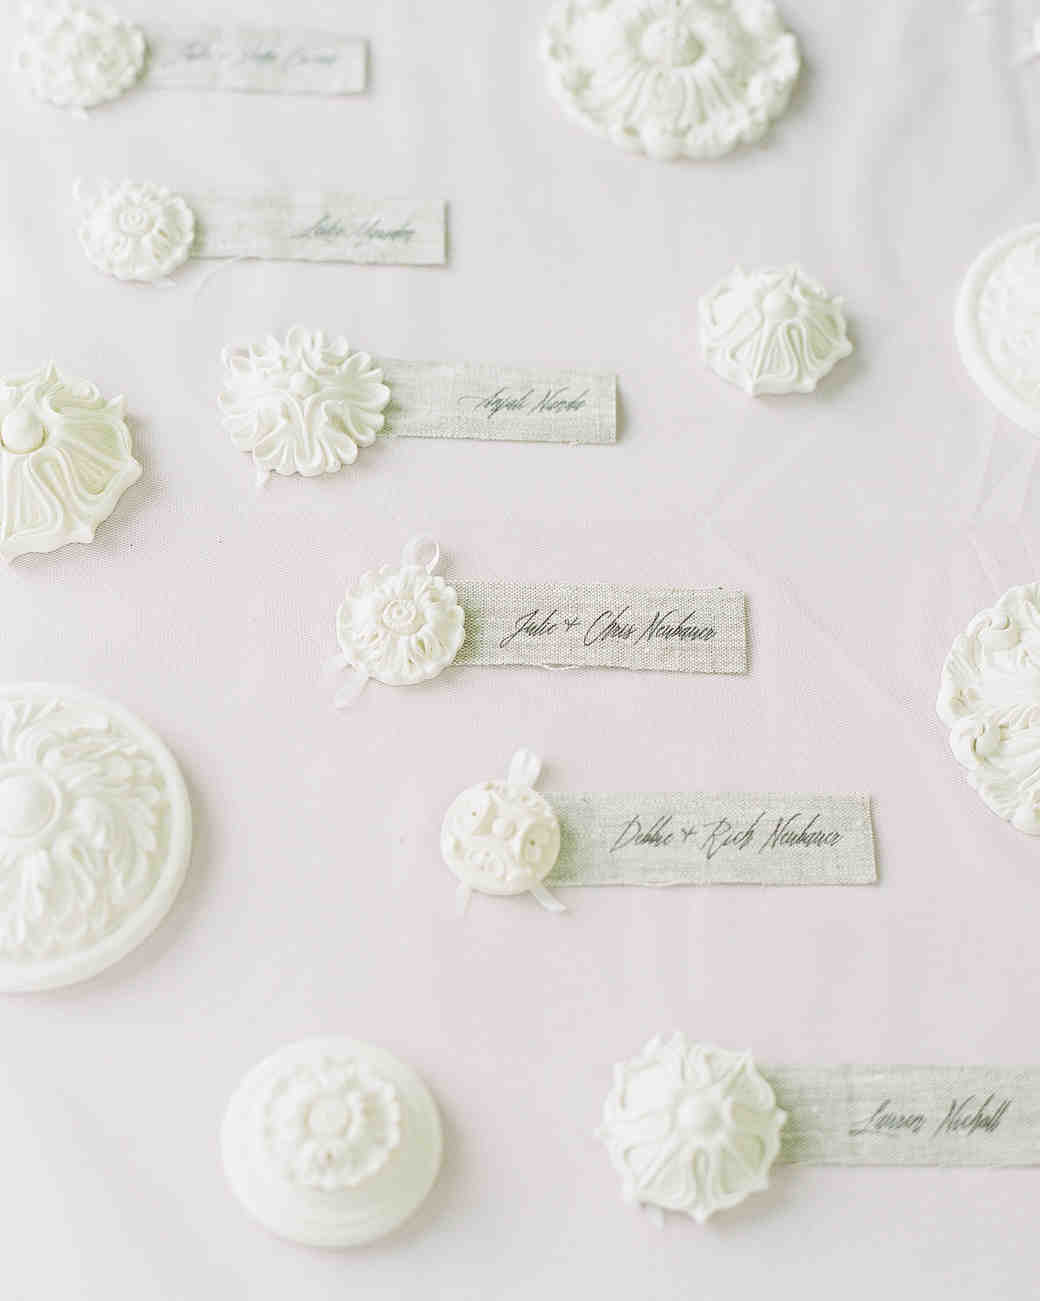 julie-chris-wedding-escortcards-1212-s12649-0216.jpg